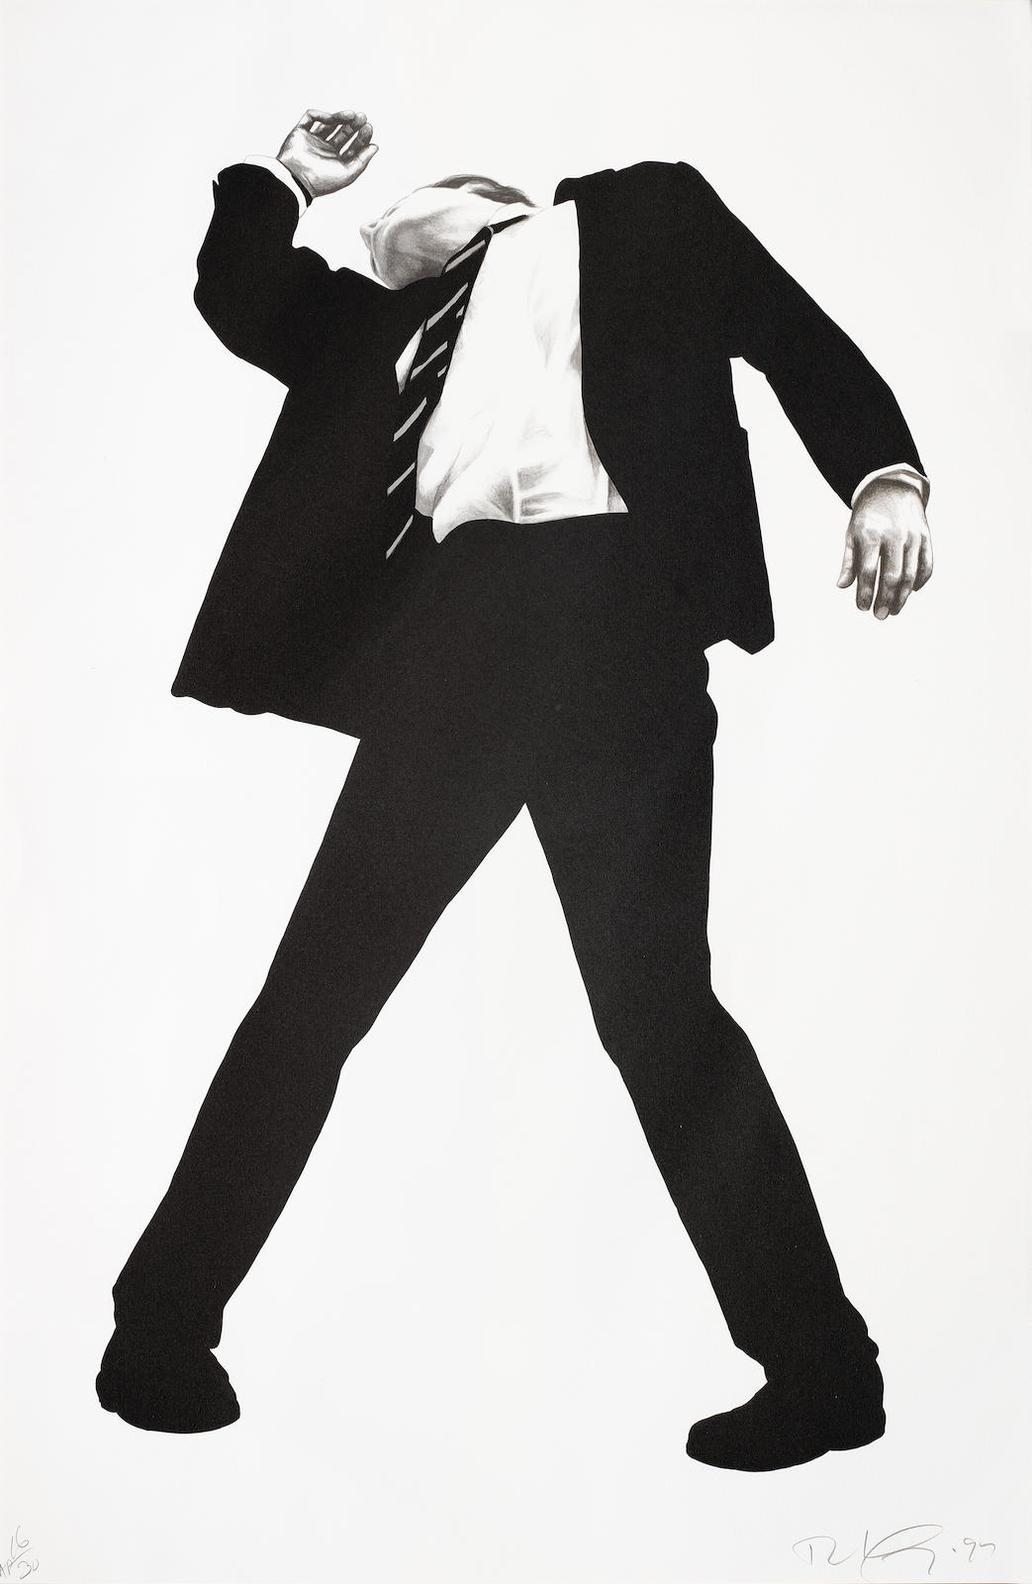 Robert Longo-Rick-1994